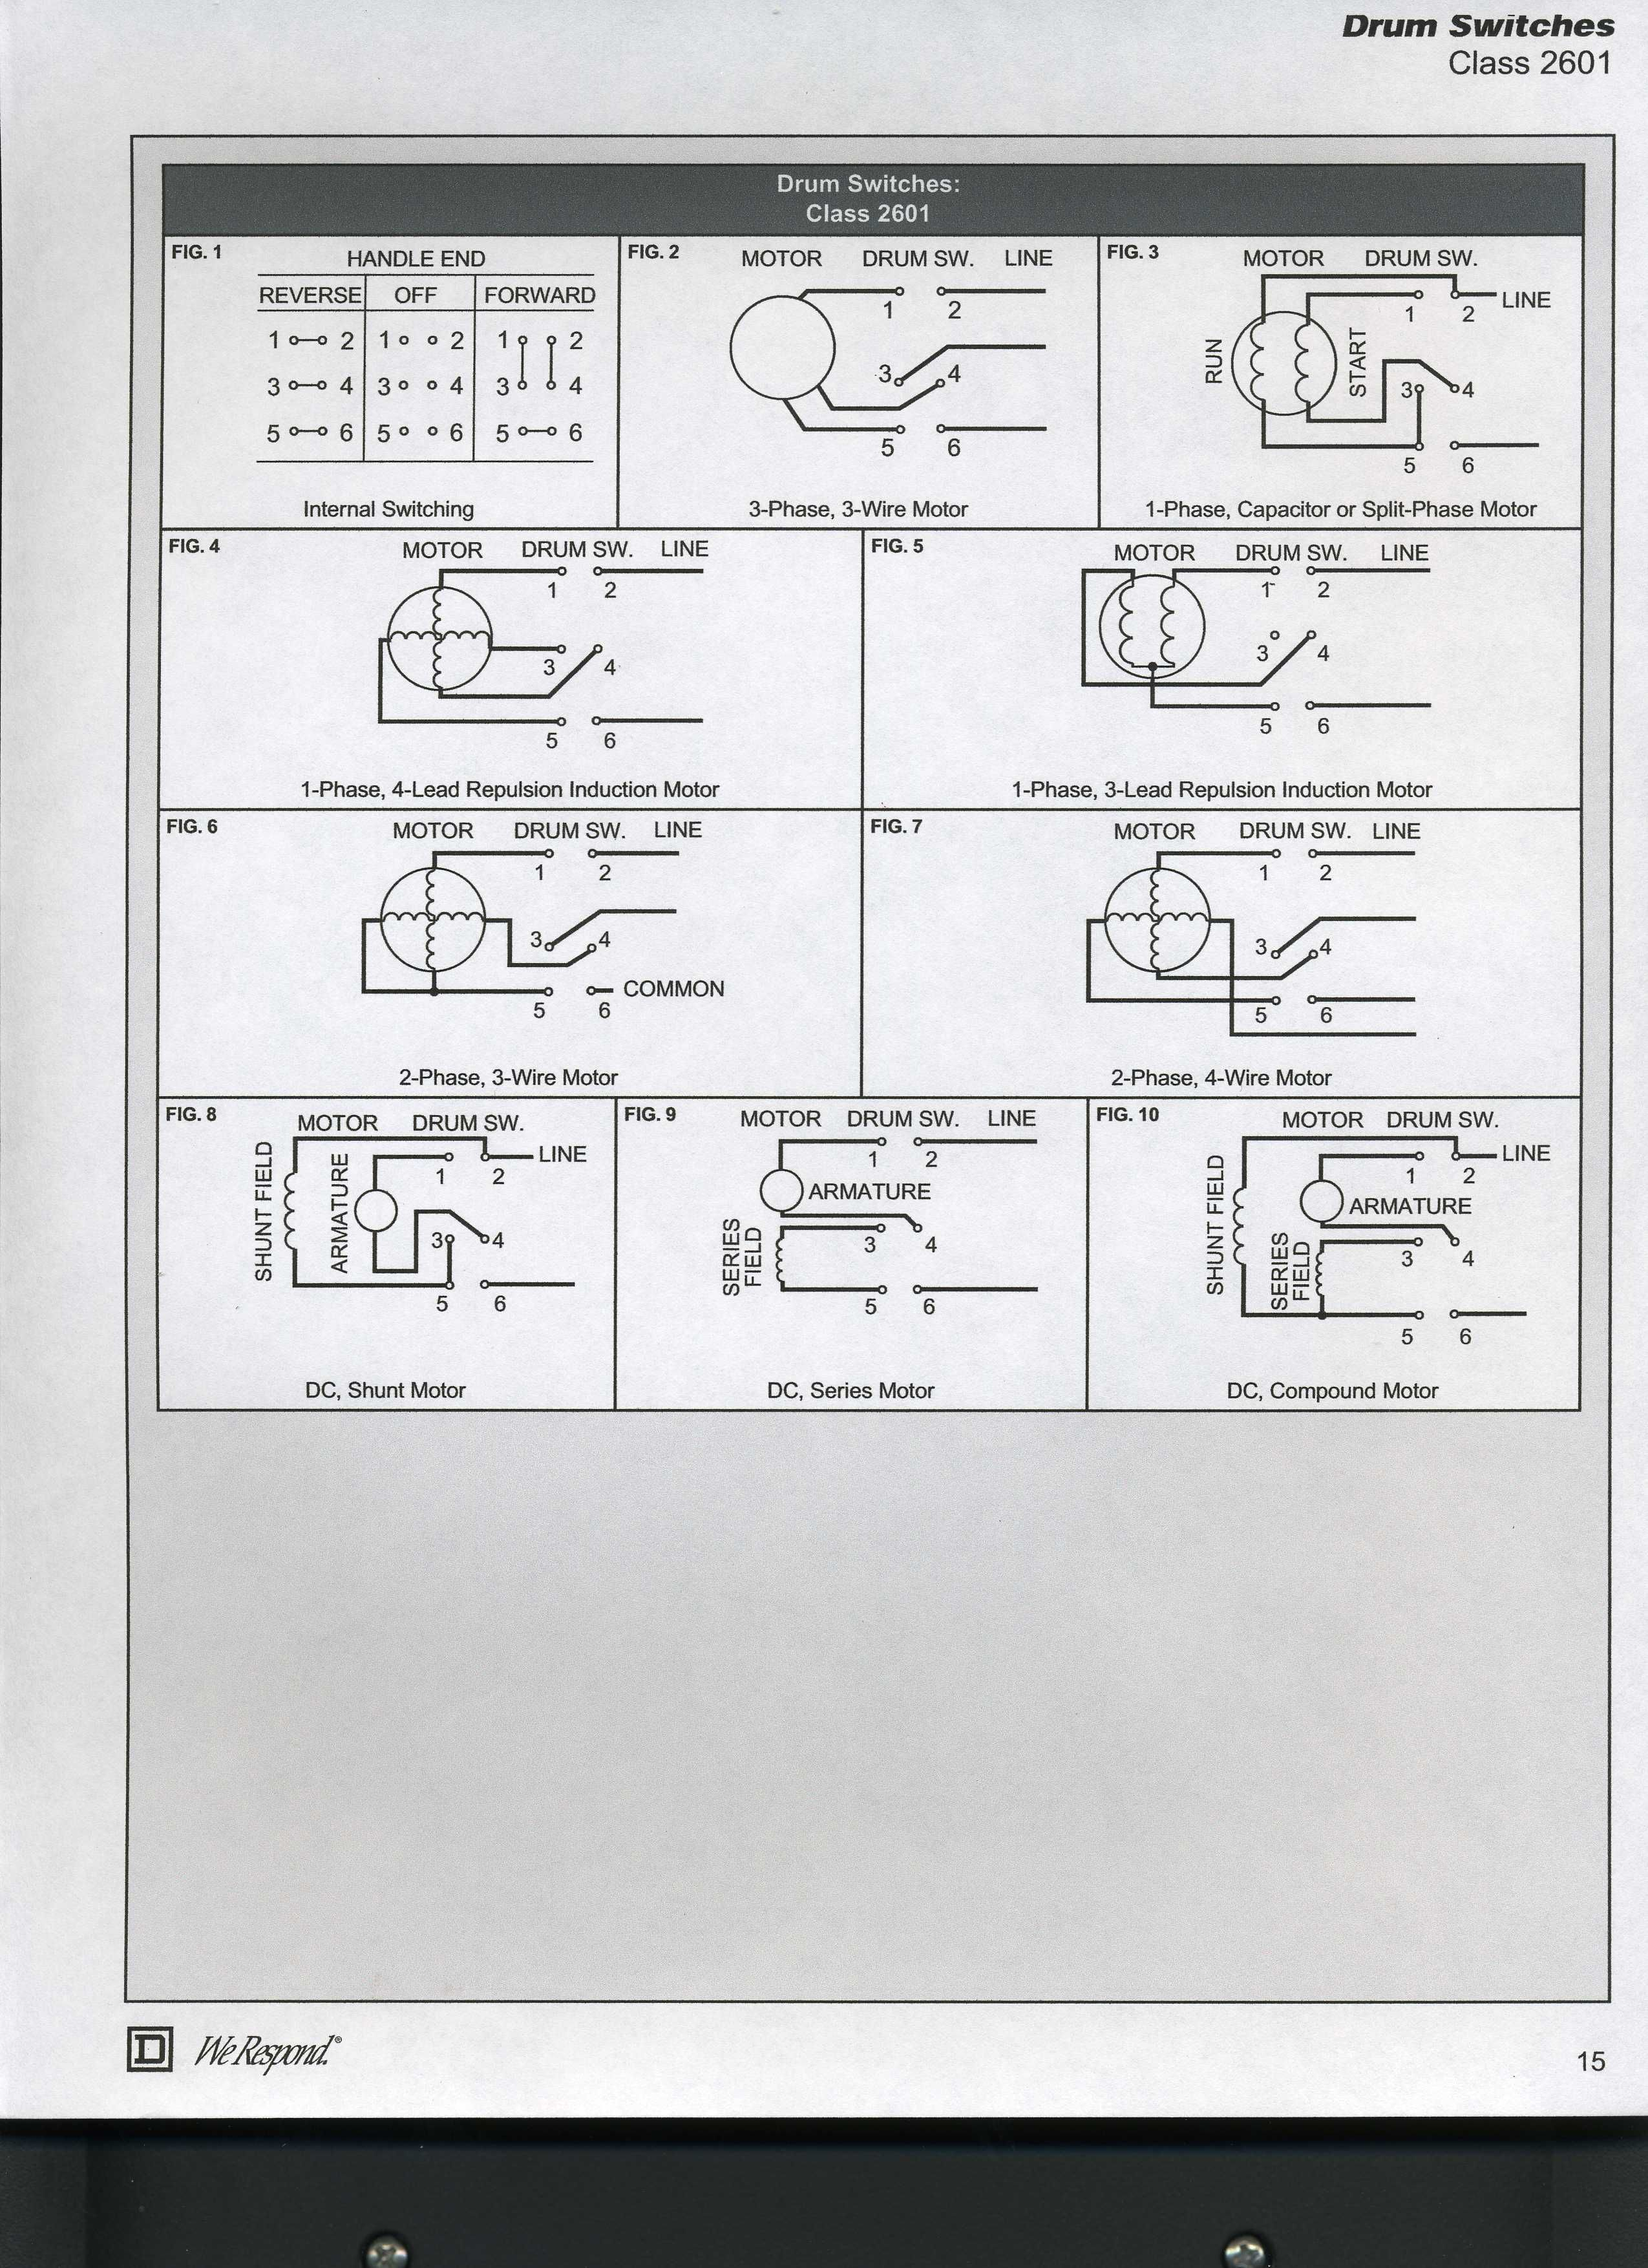 110 Volt Wiring Diagrams in 2020 Electric motor, Diagram